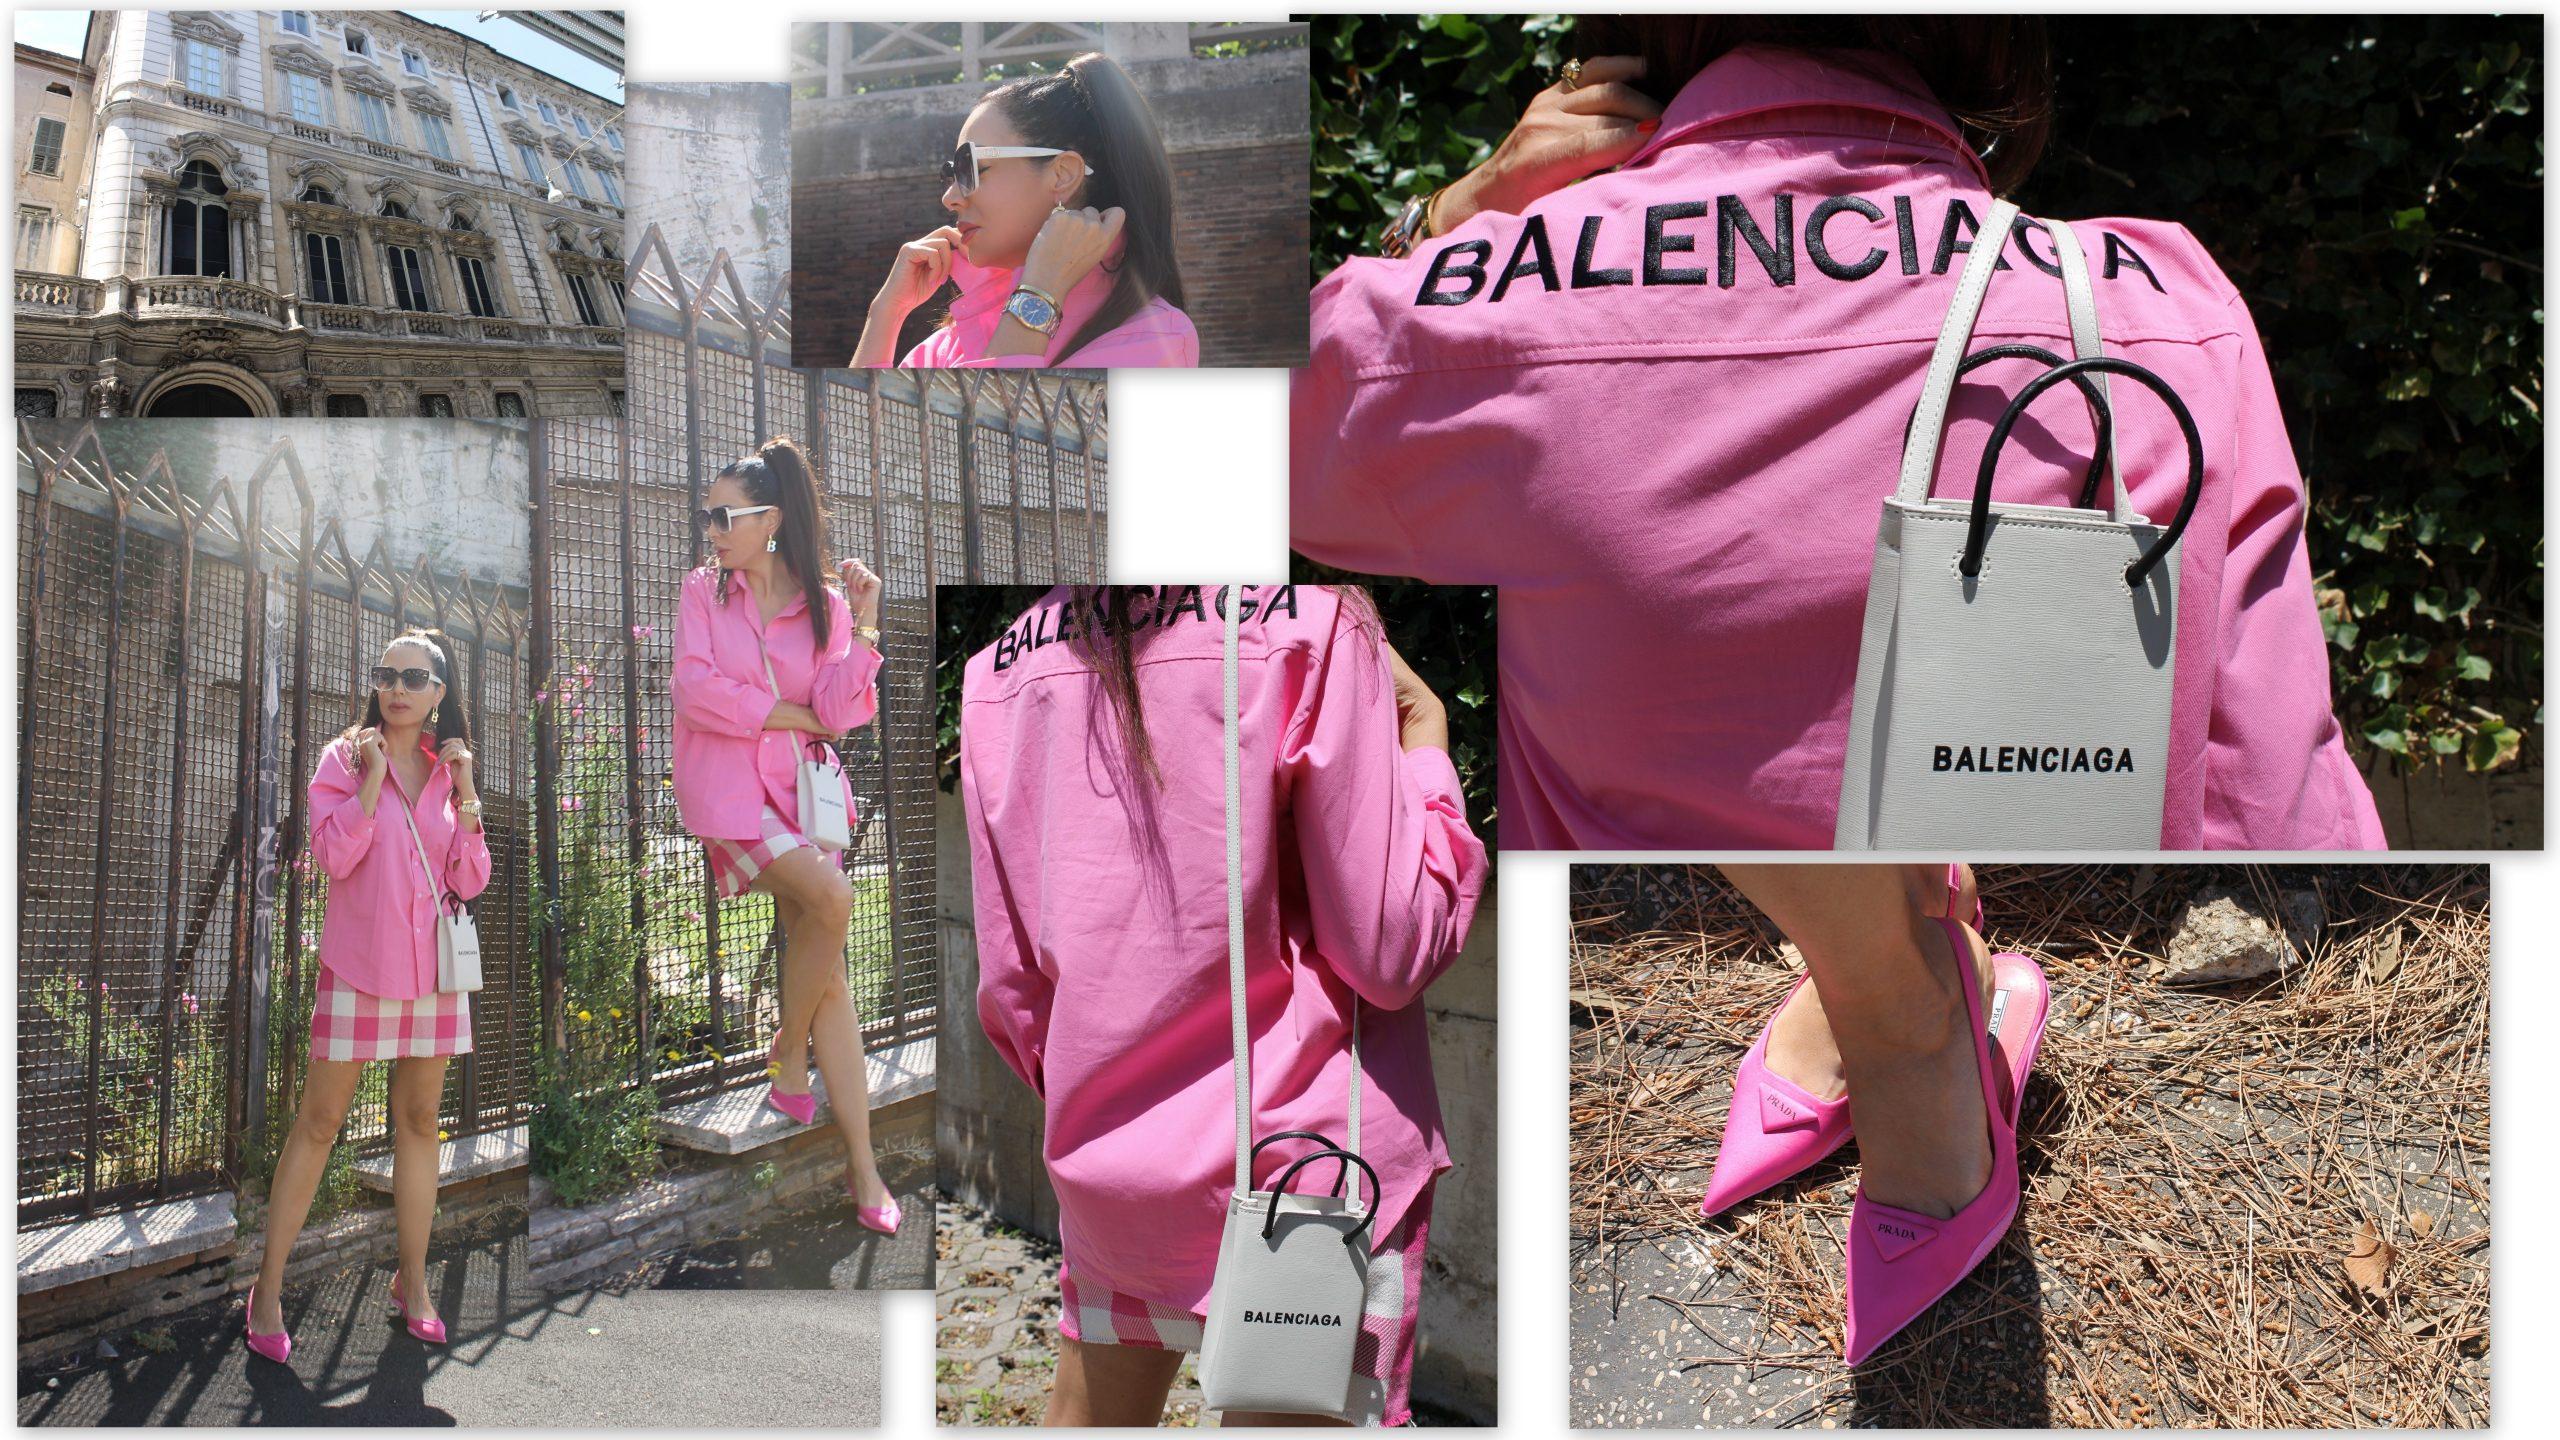 Rome Vacation Italian Summer Dream Balenciaga Look Prada Shoes Paola Lauretano